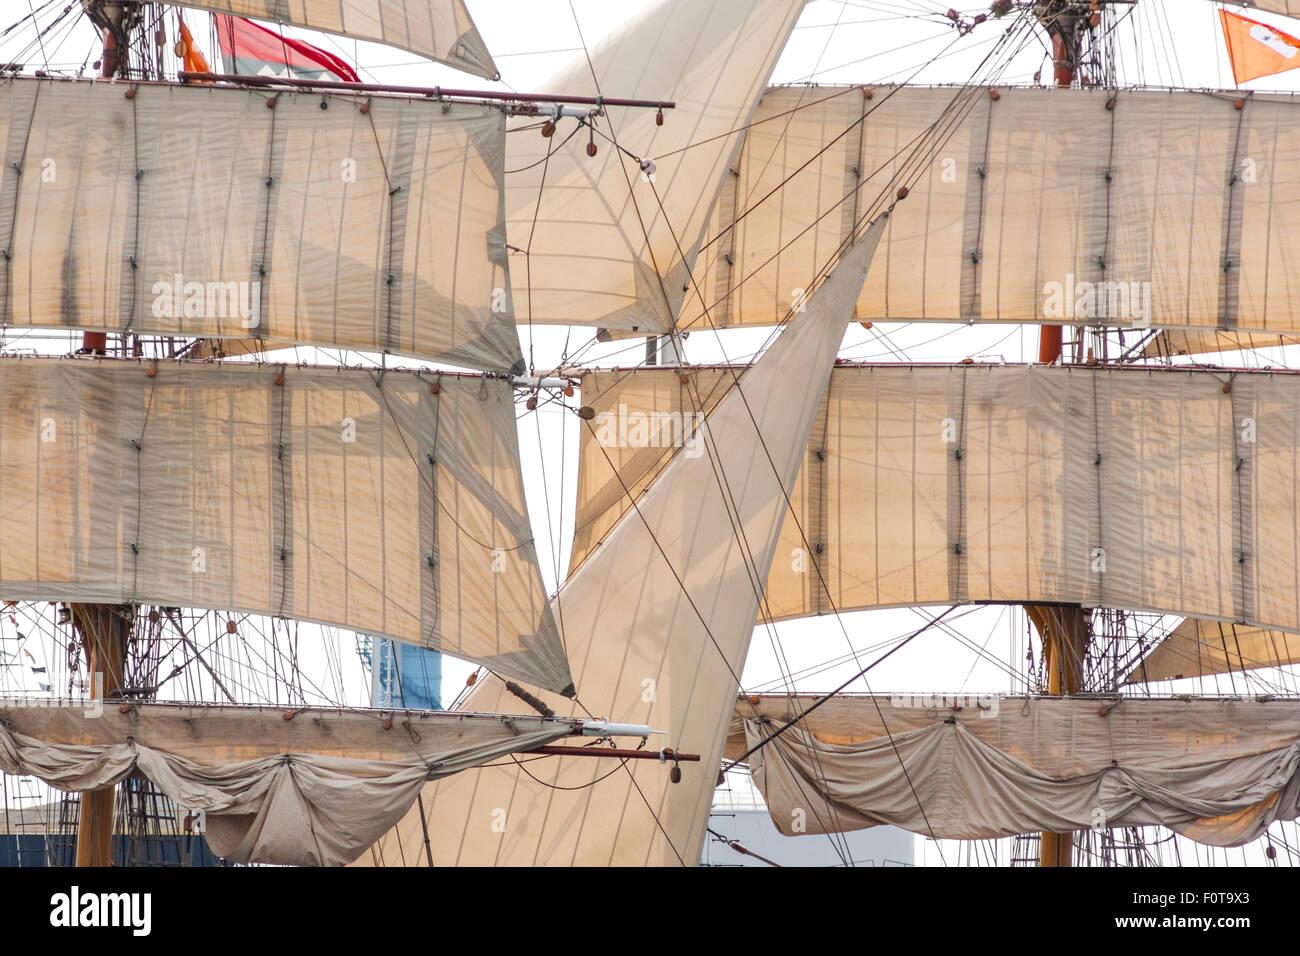 Tall Ship Sail Amsterdam Europa 2015 Photo Stock